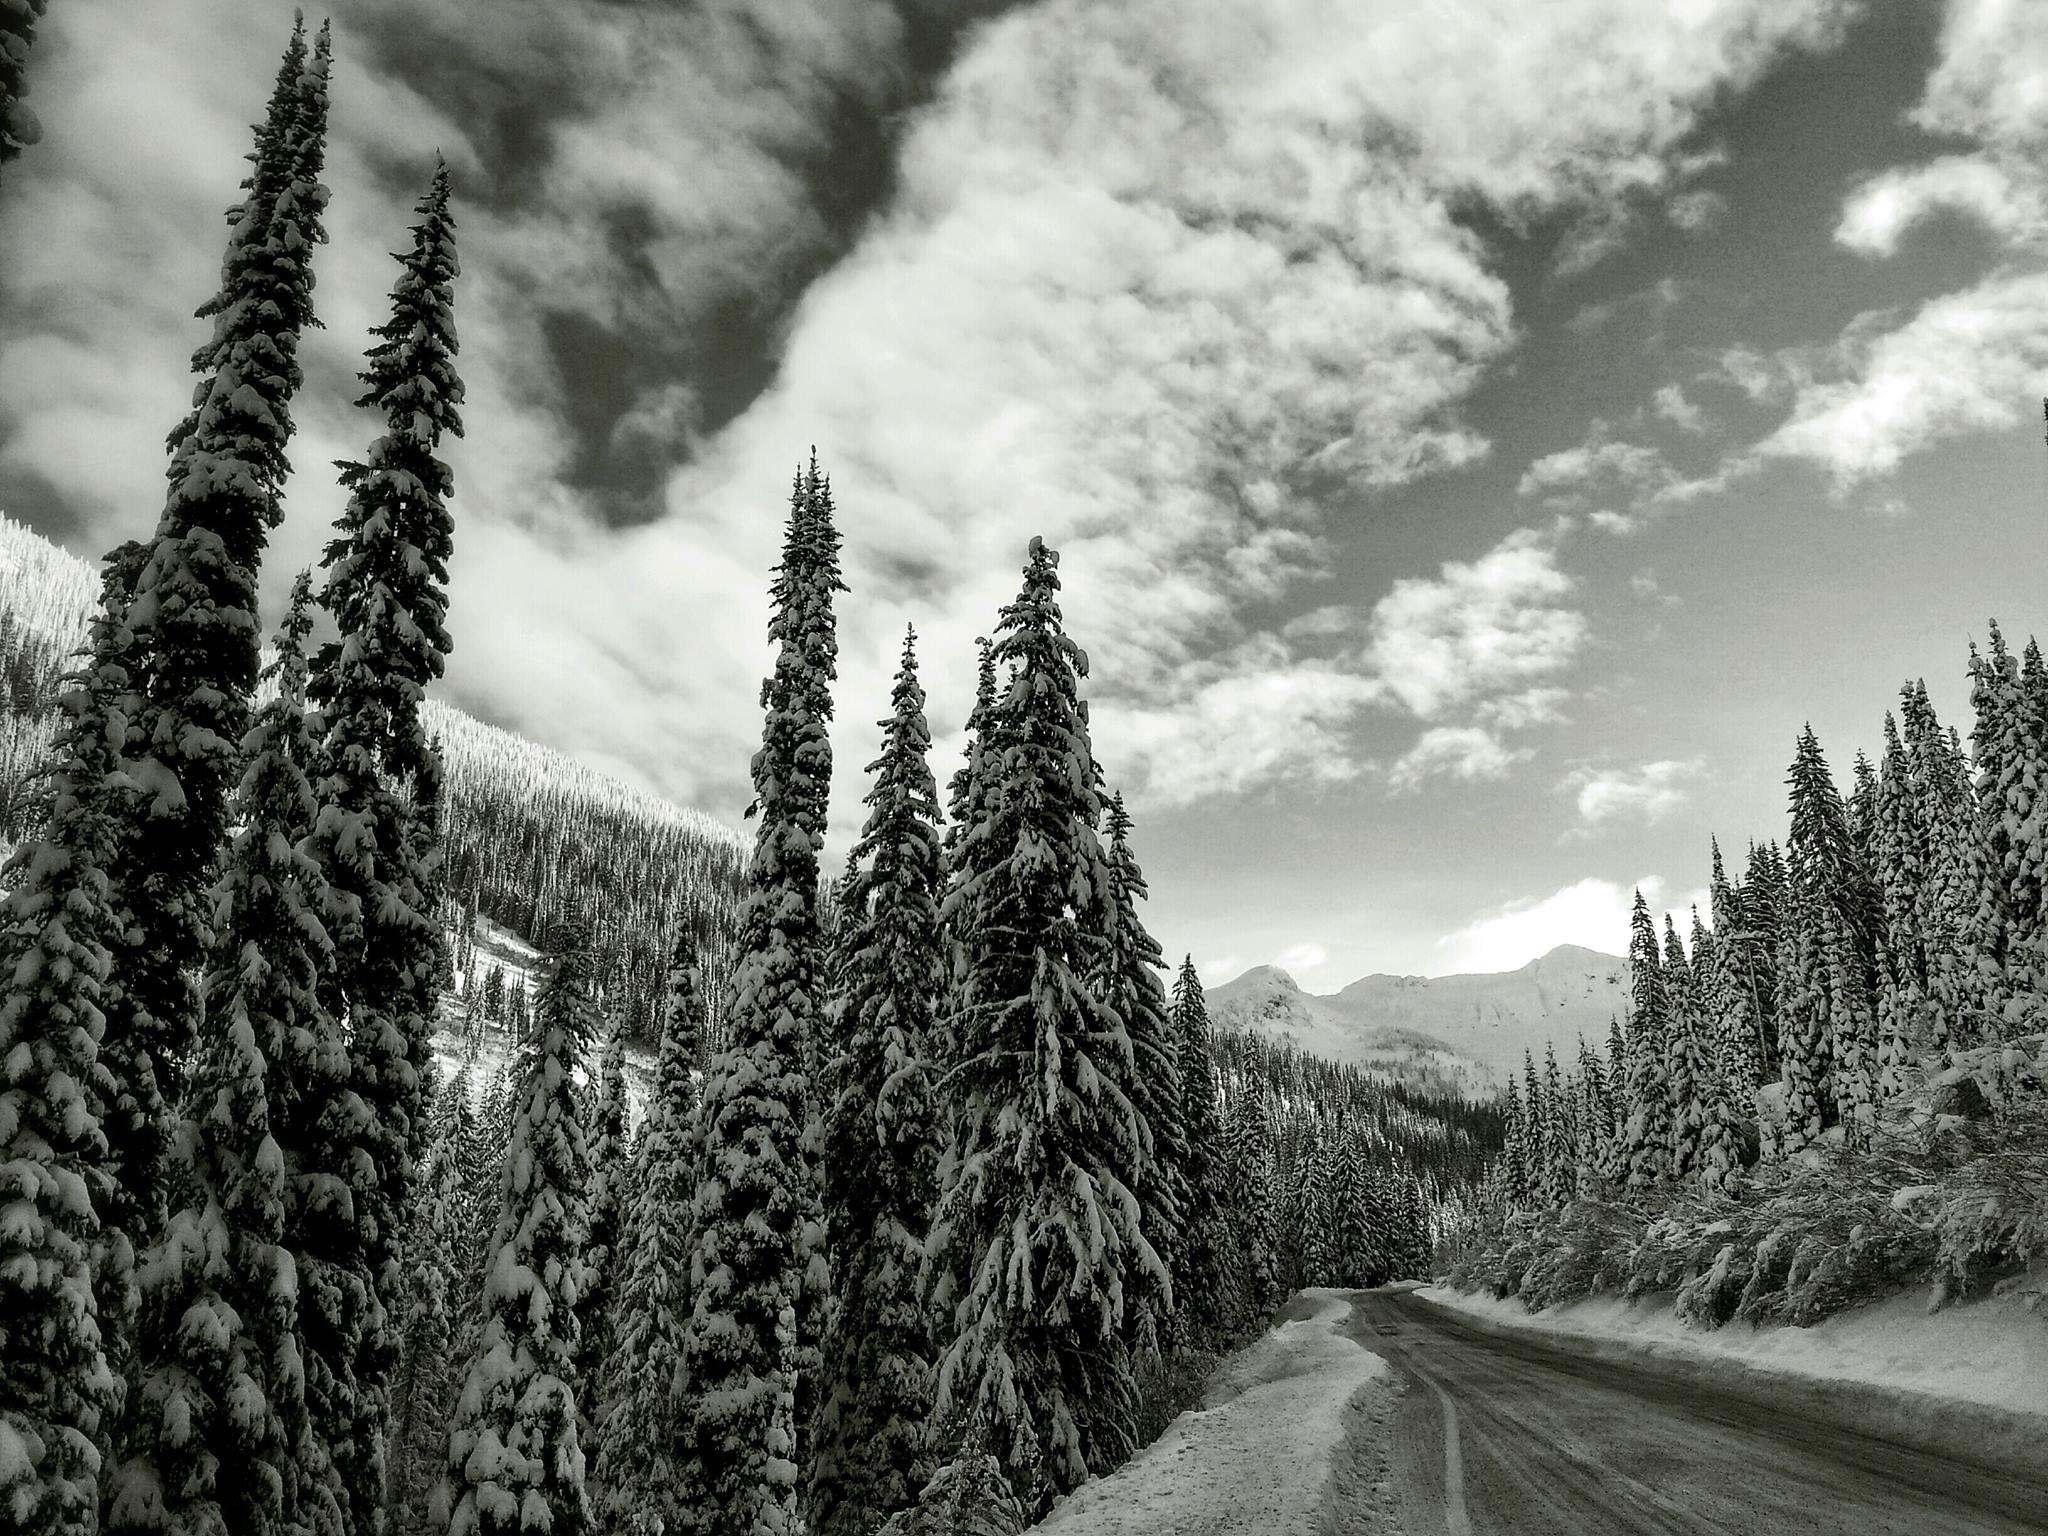 Powder Highway leads to Whitewater Ski Resort in Nelson. Photo: Gina Bégin